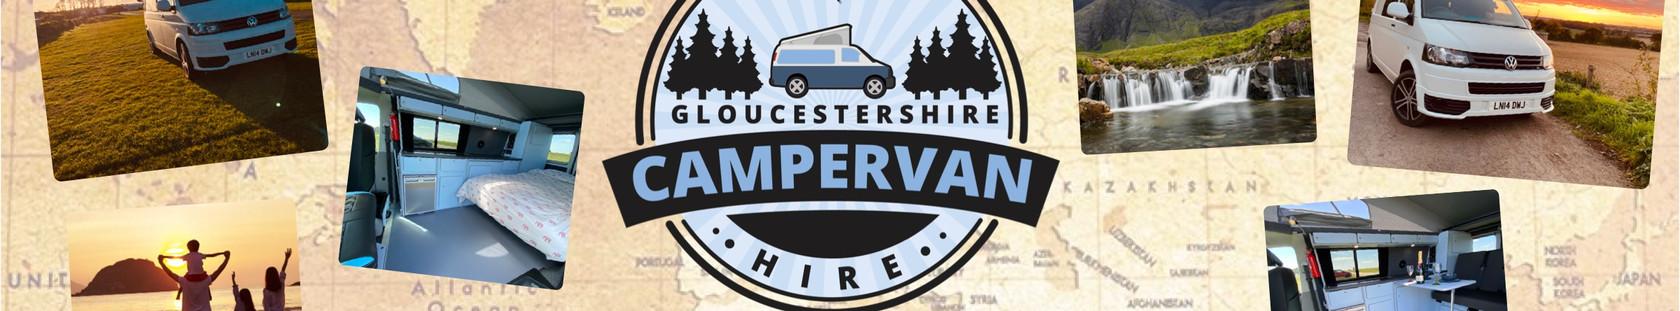 WV Campervan Hire UK